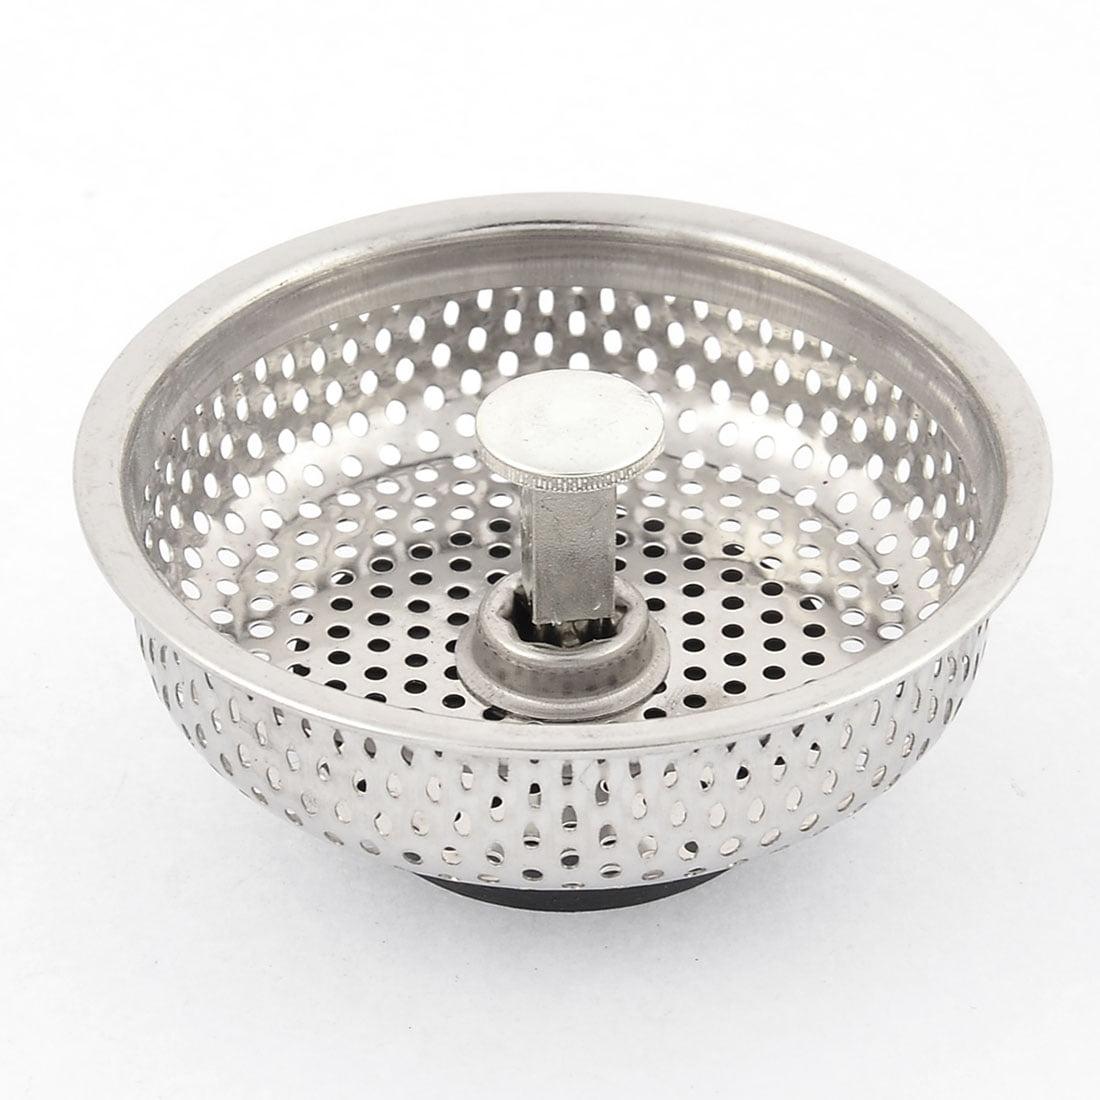 Unique Bargains Kitchen Bathroom Sink Drain Strainer Screen Stopper Metal Filter Basket 83mm Dia